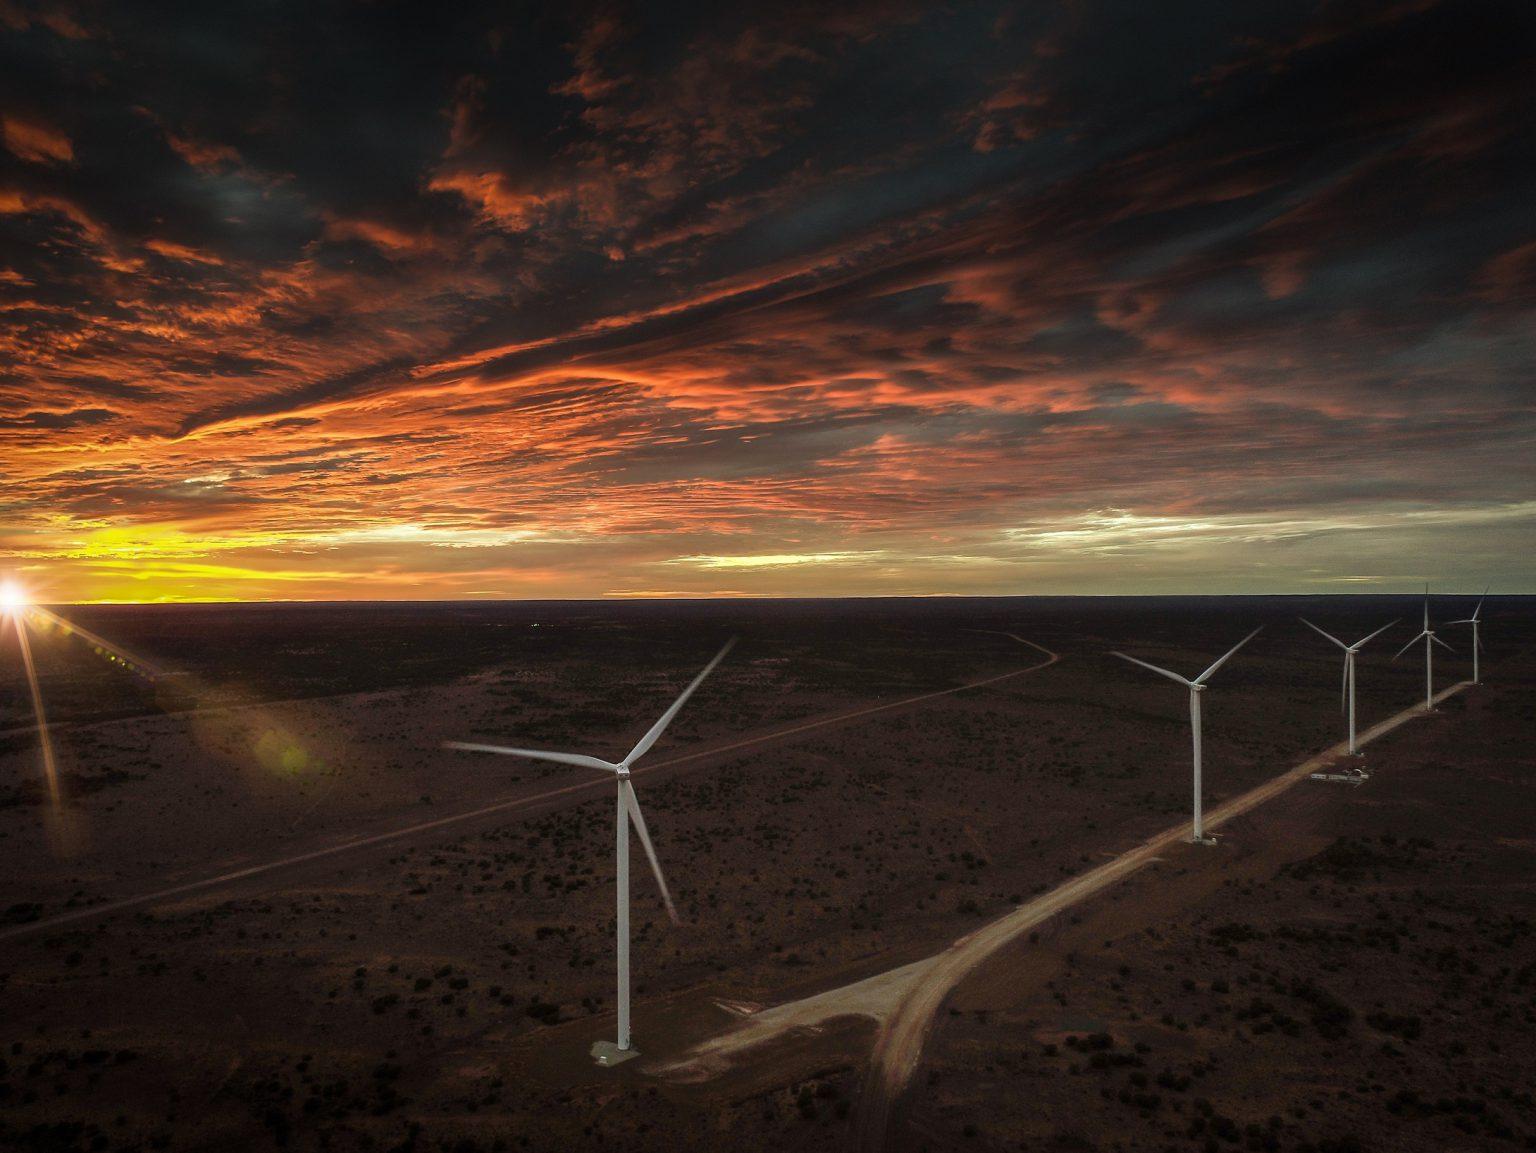 Agnew-Hybrid-Renewable-Project-wind-turbines-April-2020-1536x1153